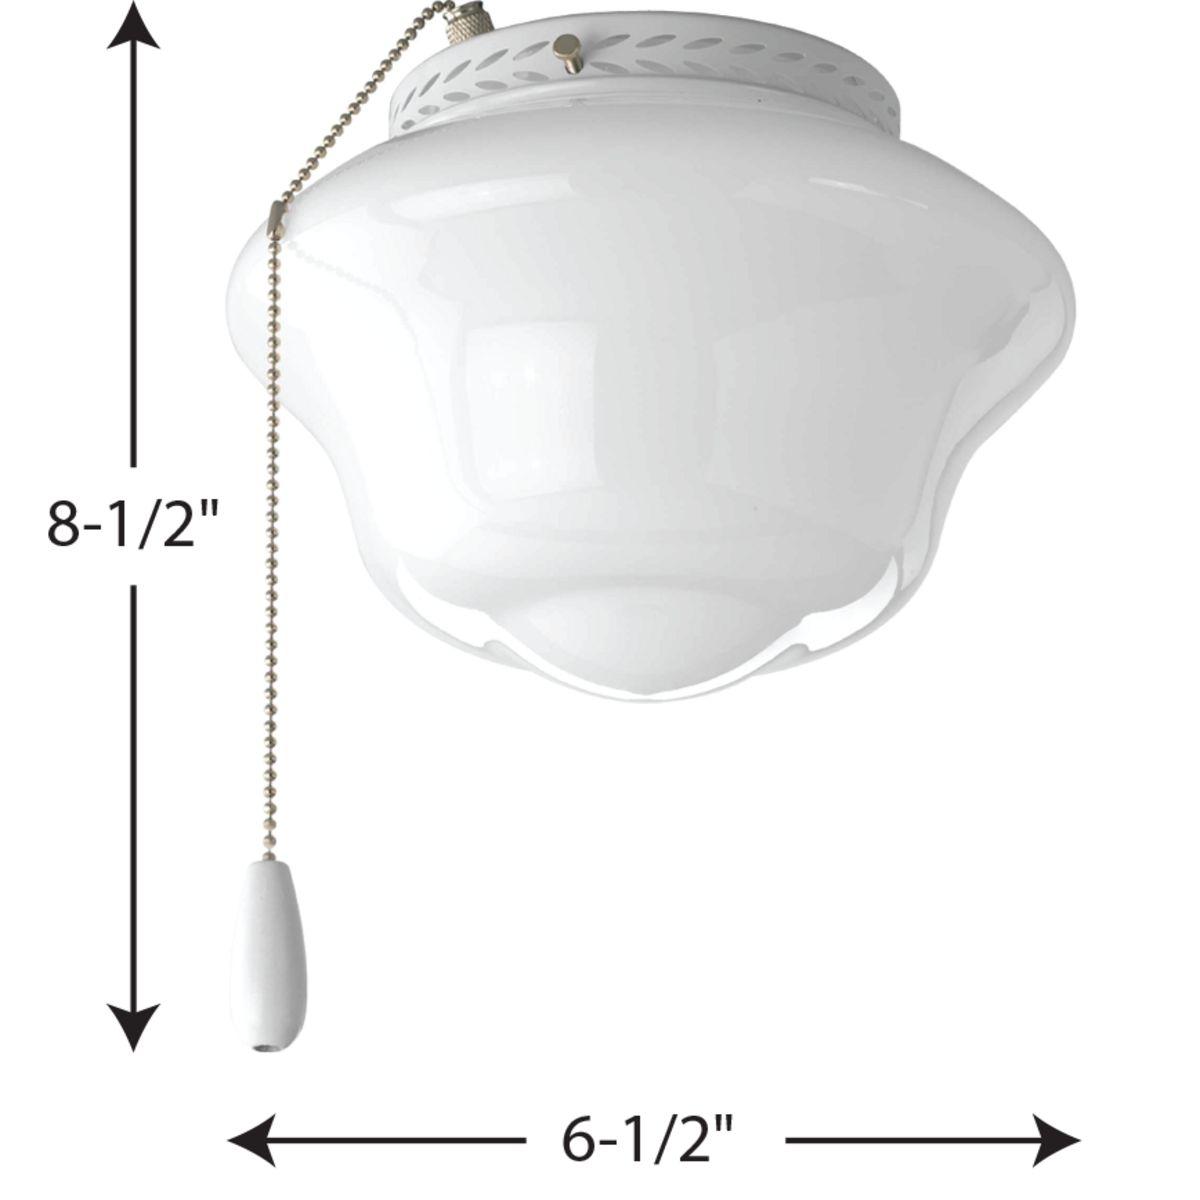 Airpro Collection One Light Ceiling Fan Light P2644 30 Progress Lighting